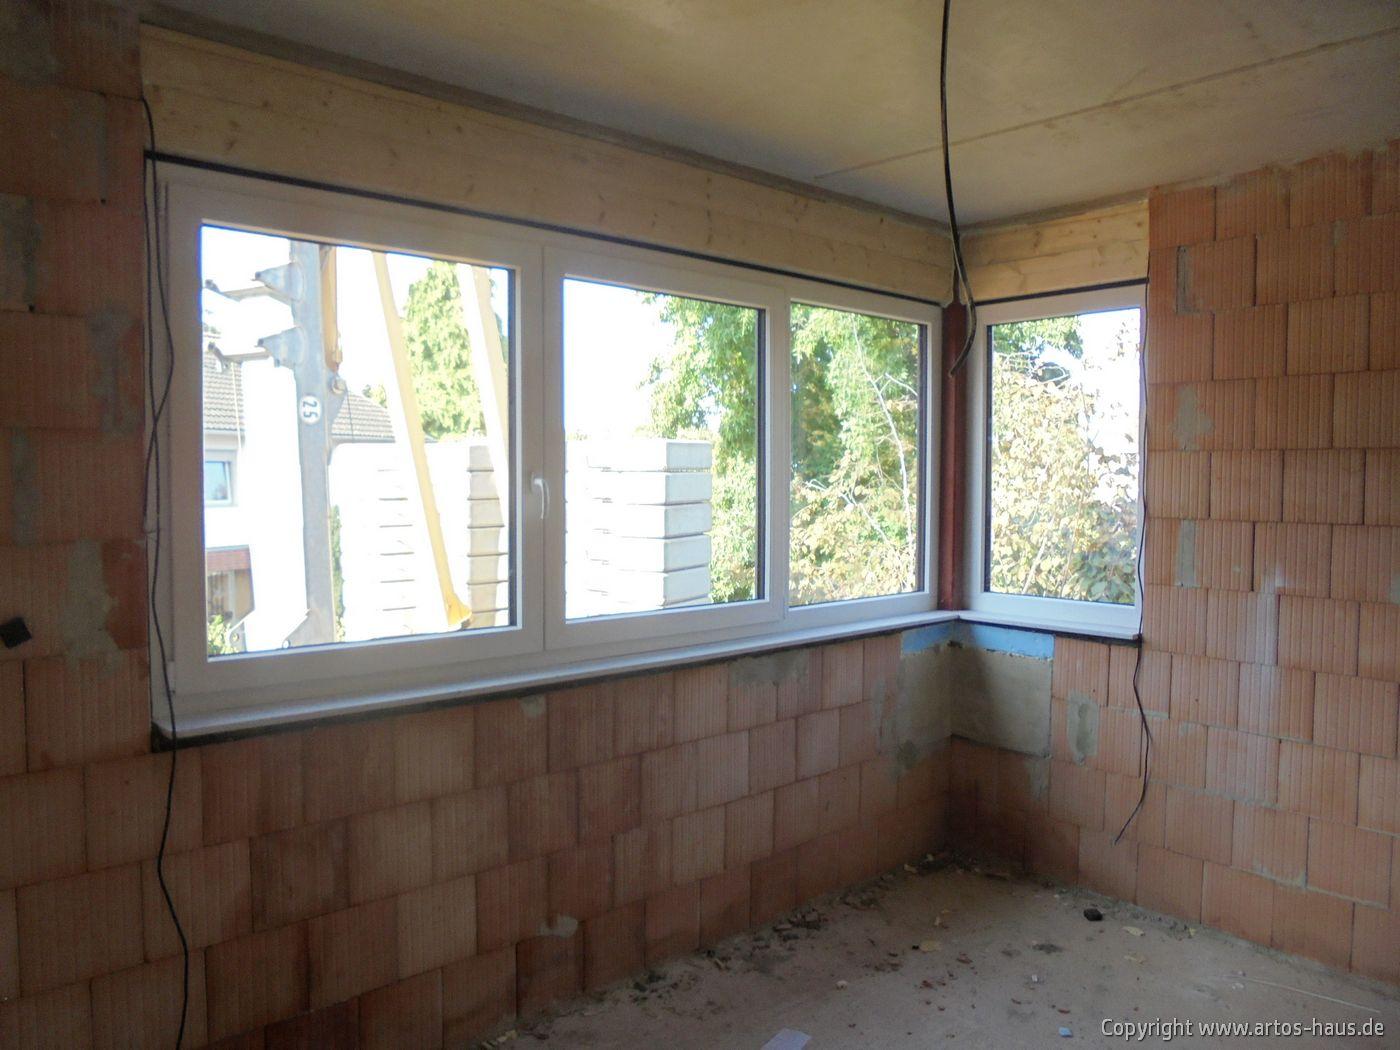 Fenstereinbau MFH Pulheim / ARTOS-HAUS Bild 2